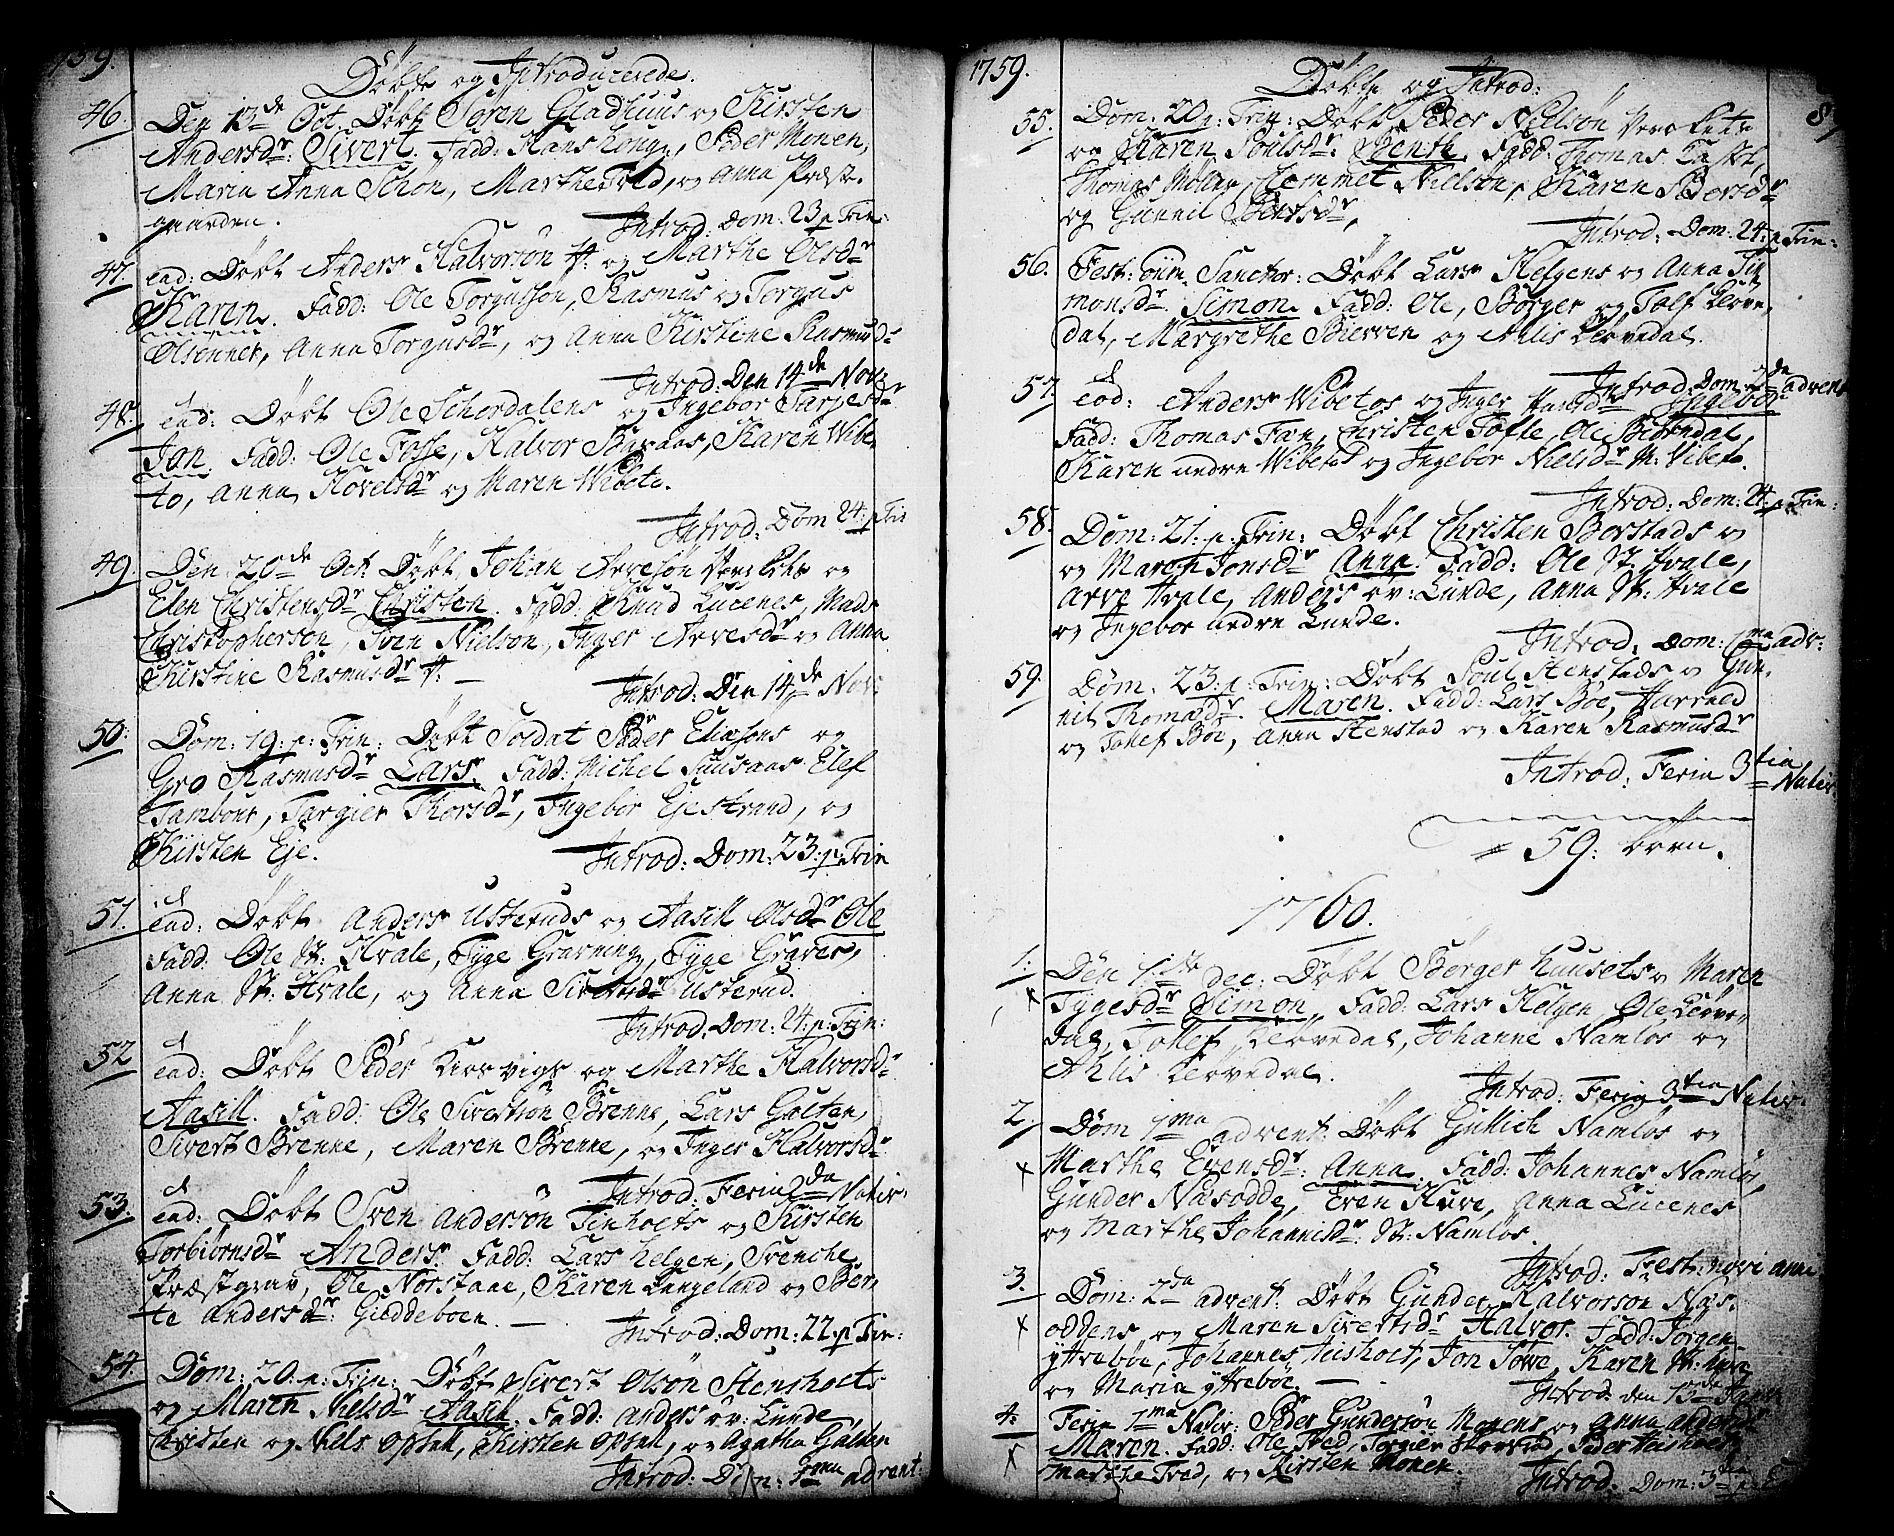 SAKO, Holla kirkebøker, F/Fa/L0001: Ministerialbok nr. 1, 1717-1779, s. 80